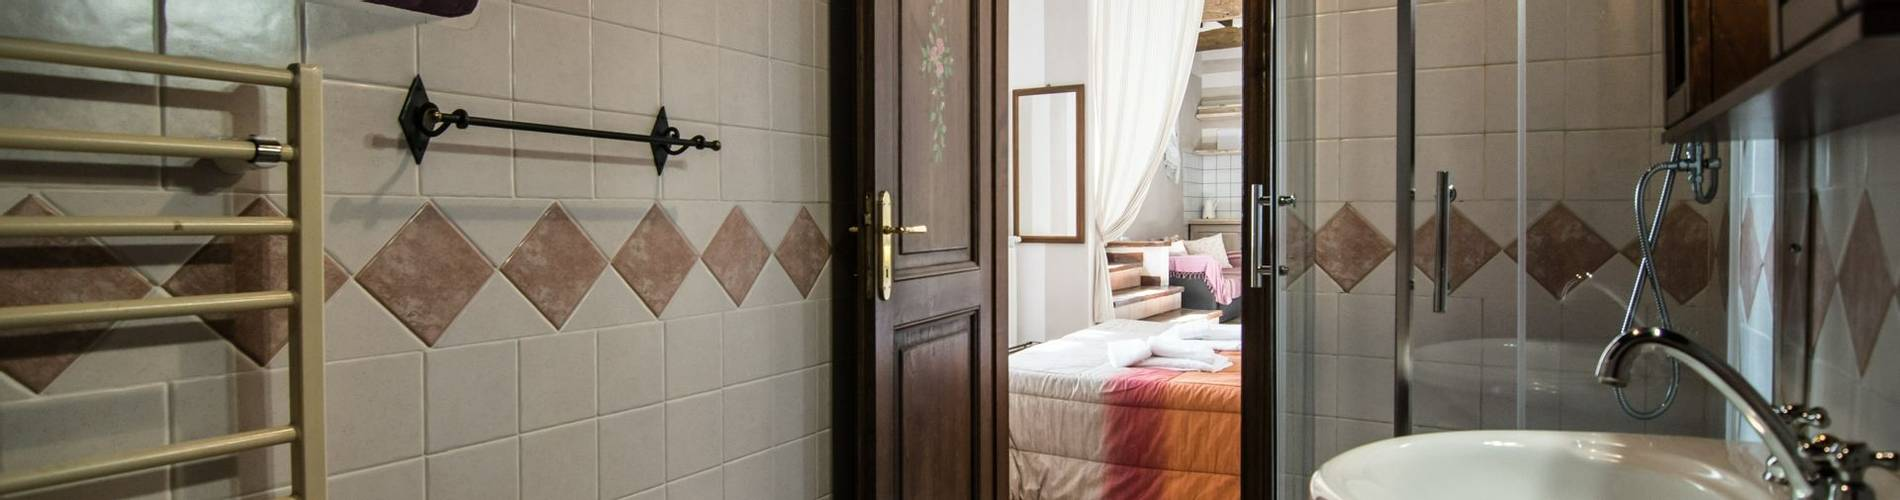 Montemenardo, Umbria, Italy, Il Pozzo Room (2).jpg